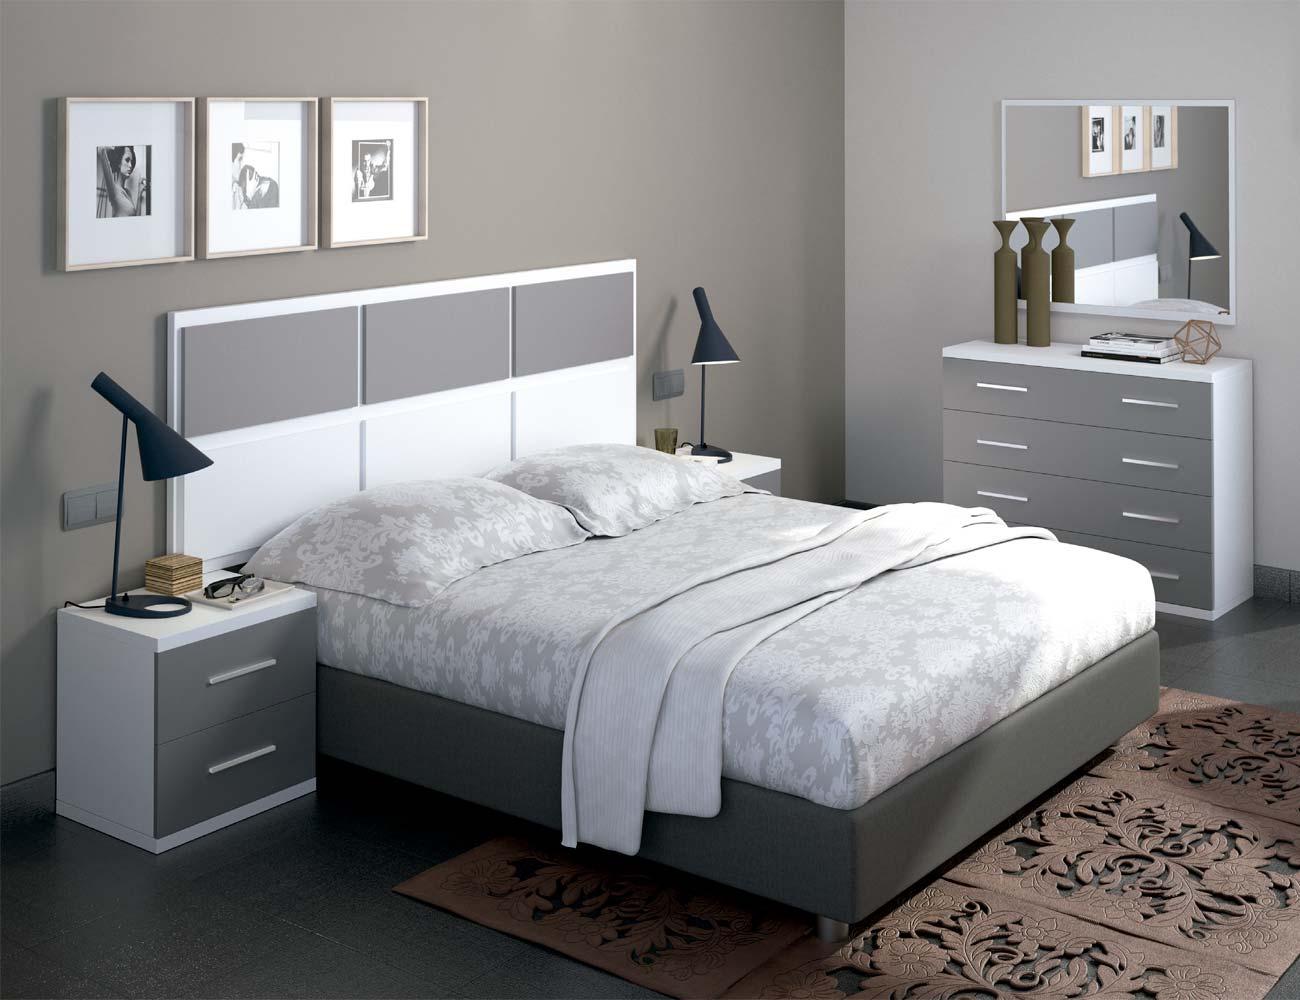 Dormitorio matrimonio moderno 31 blanco gris